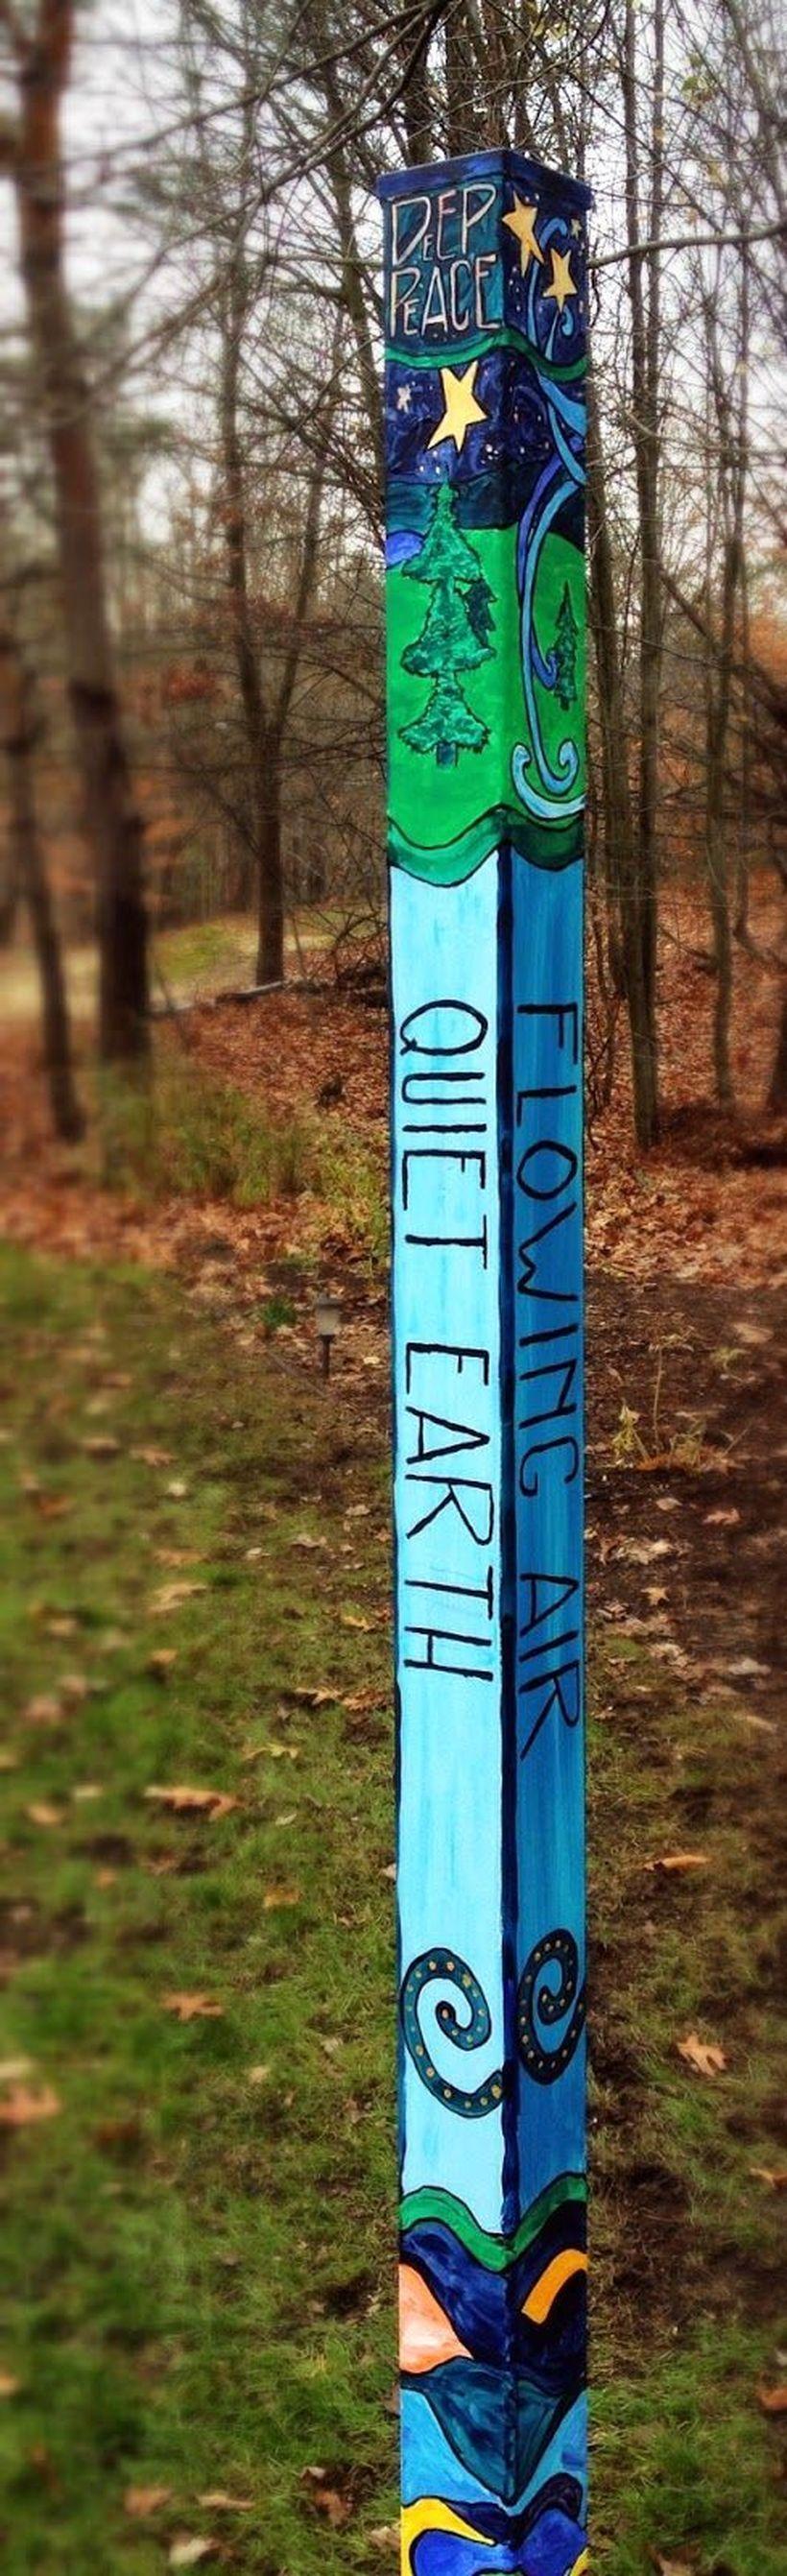 25 colorful peace poles design ideas for your garden https